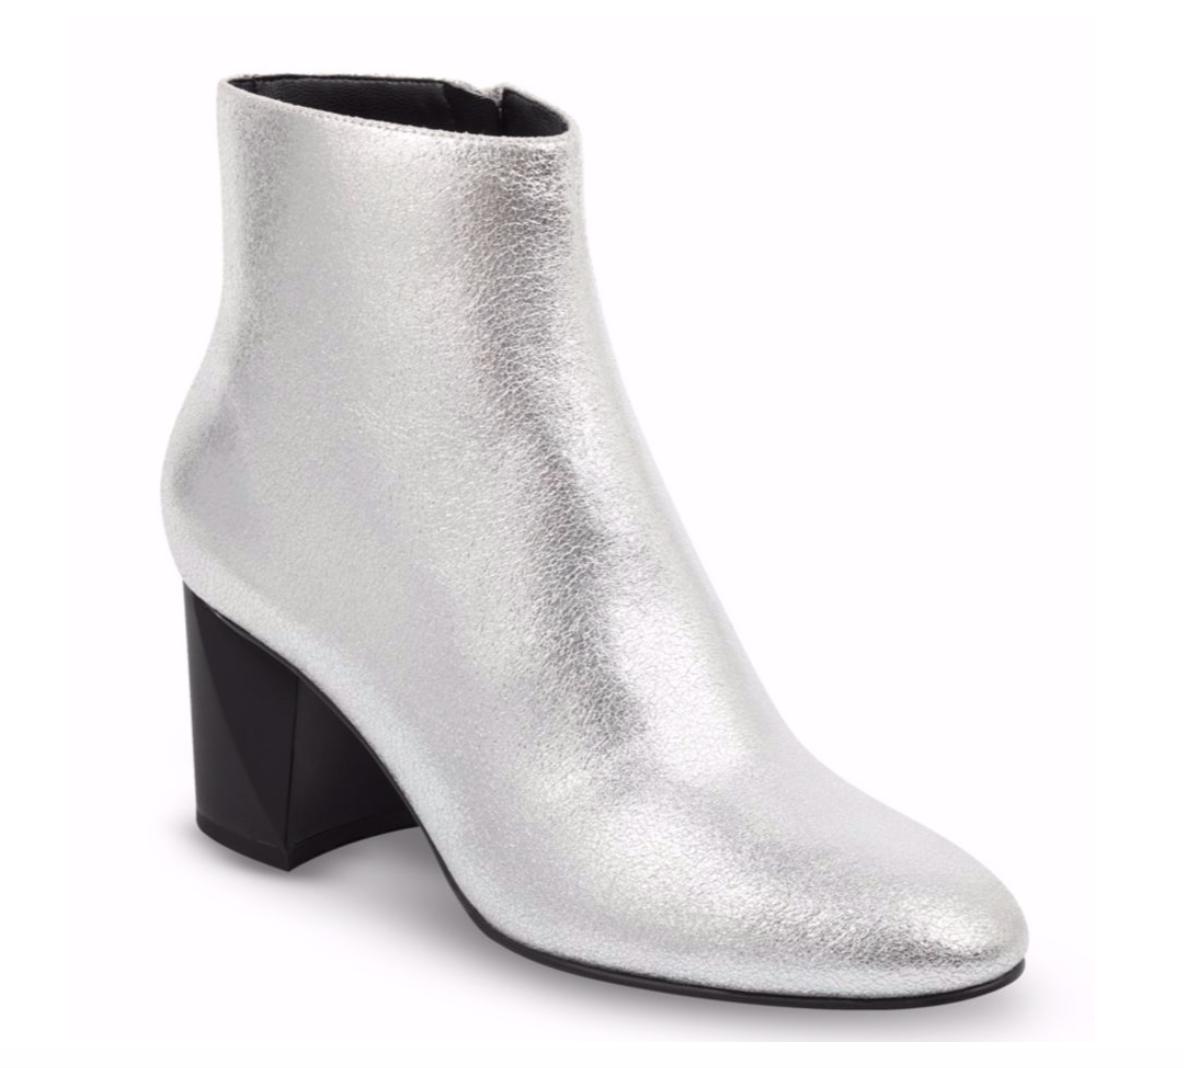 Boots: ysl | Similar:  Kendall + Kylie